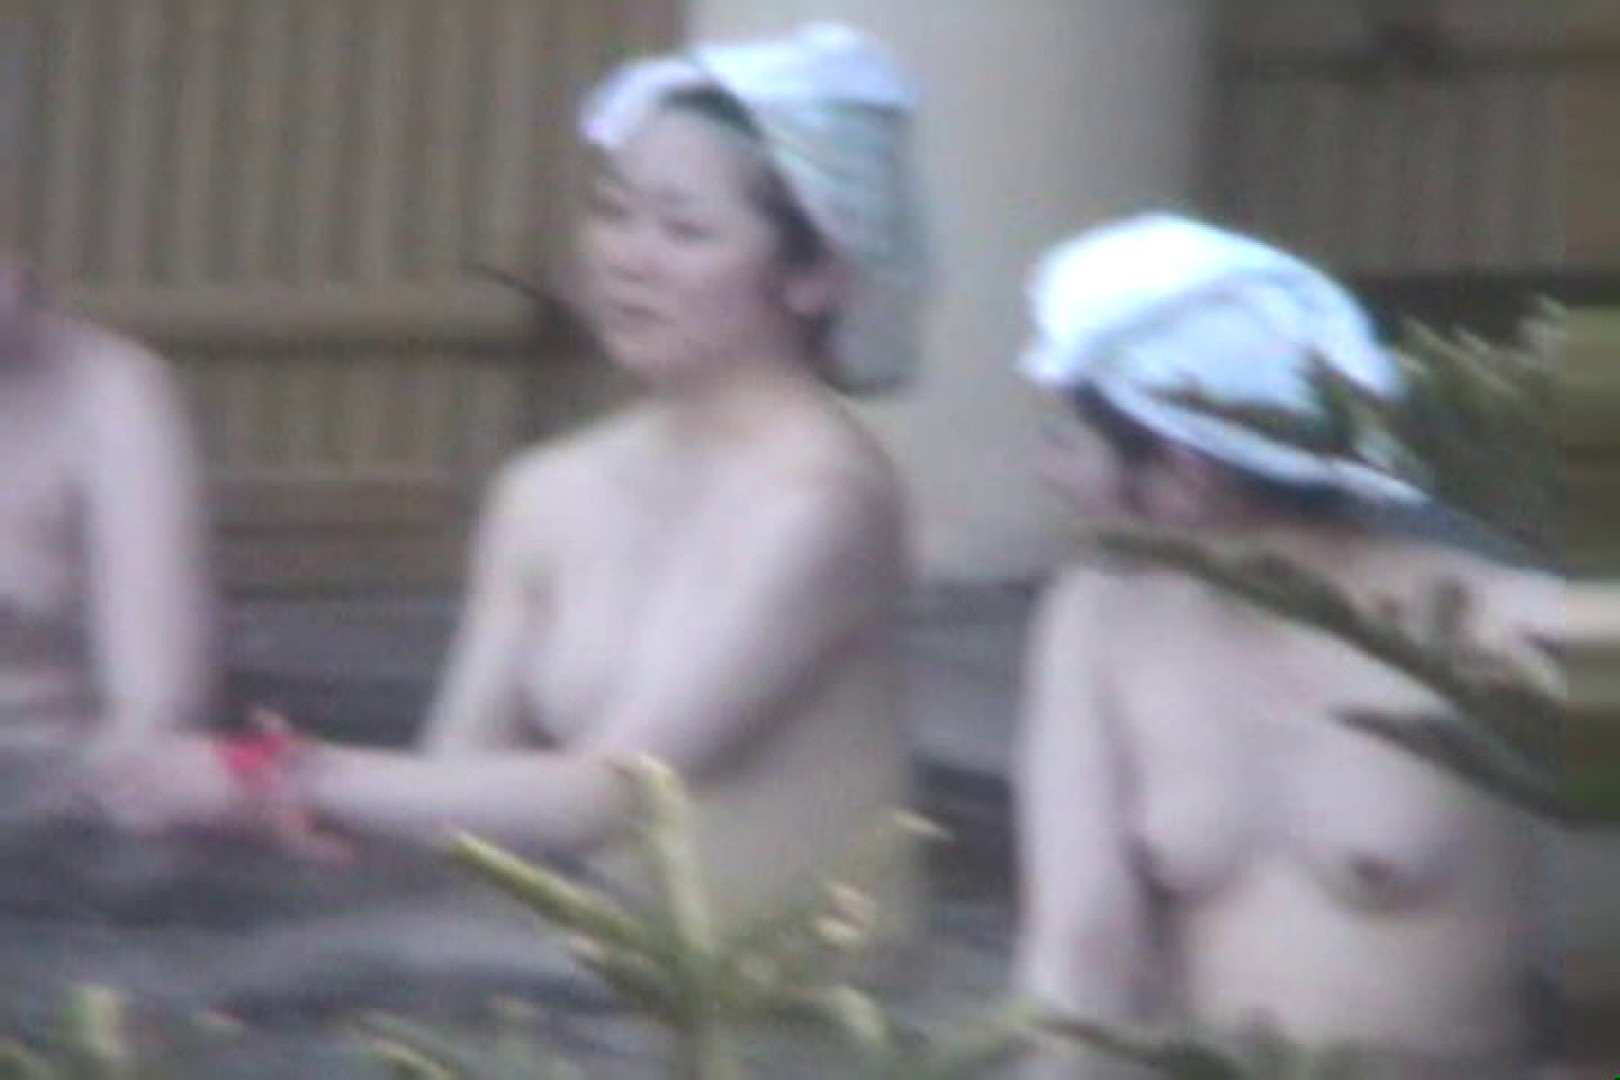 Aquaな露天風呂Vol.86【VIP限定】 OLのエロ生活 オマンコ無修正動画無料 96連発 56